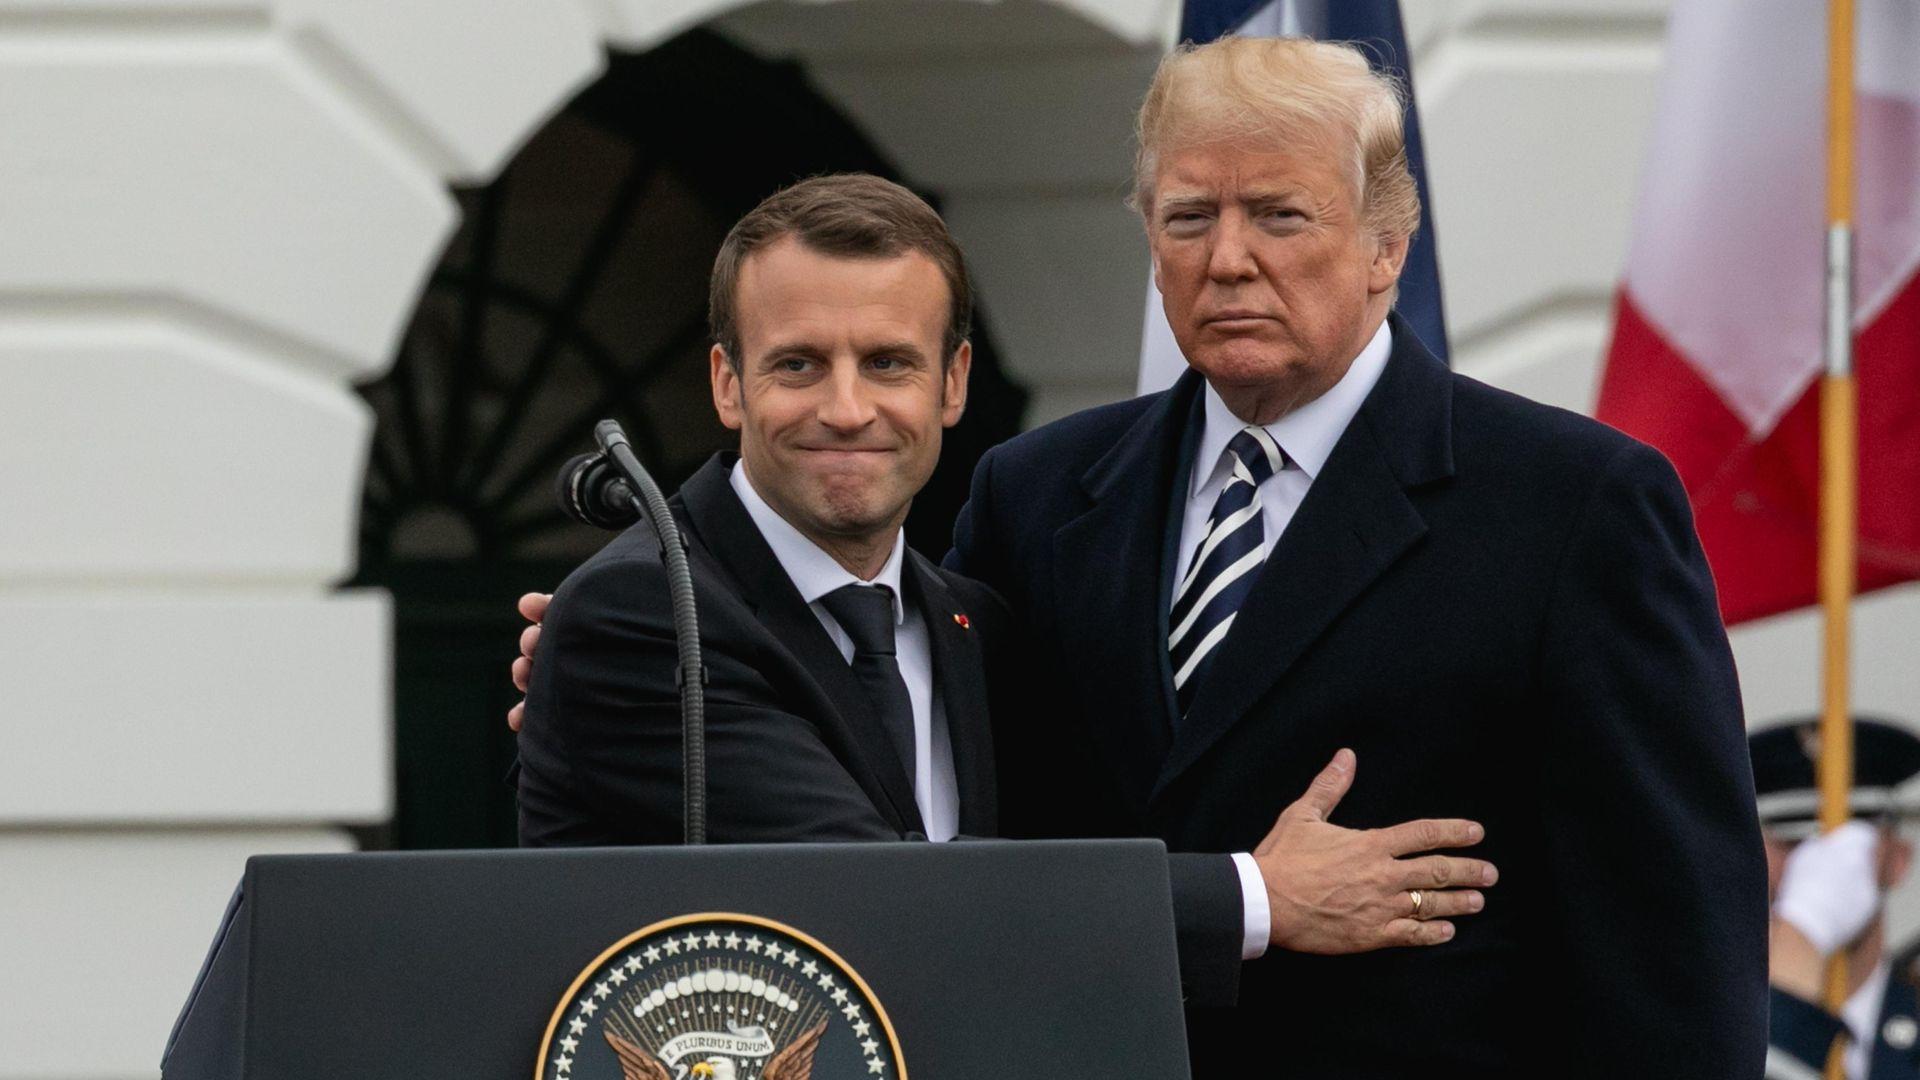 French President Emmanuel Macron and then US President Donald Trump hug - Credit: NurPhoto via Getty Images